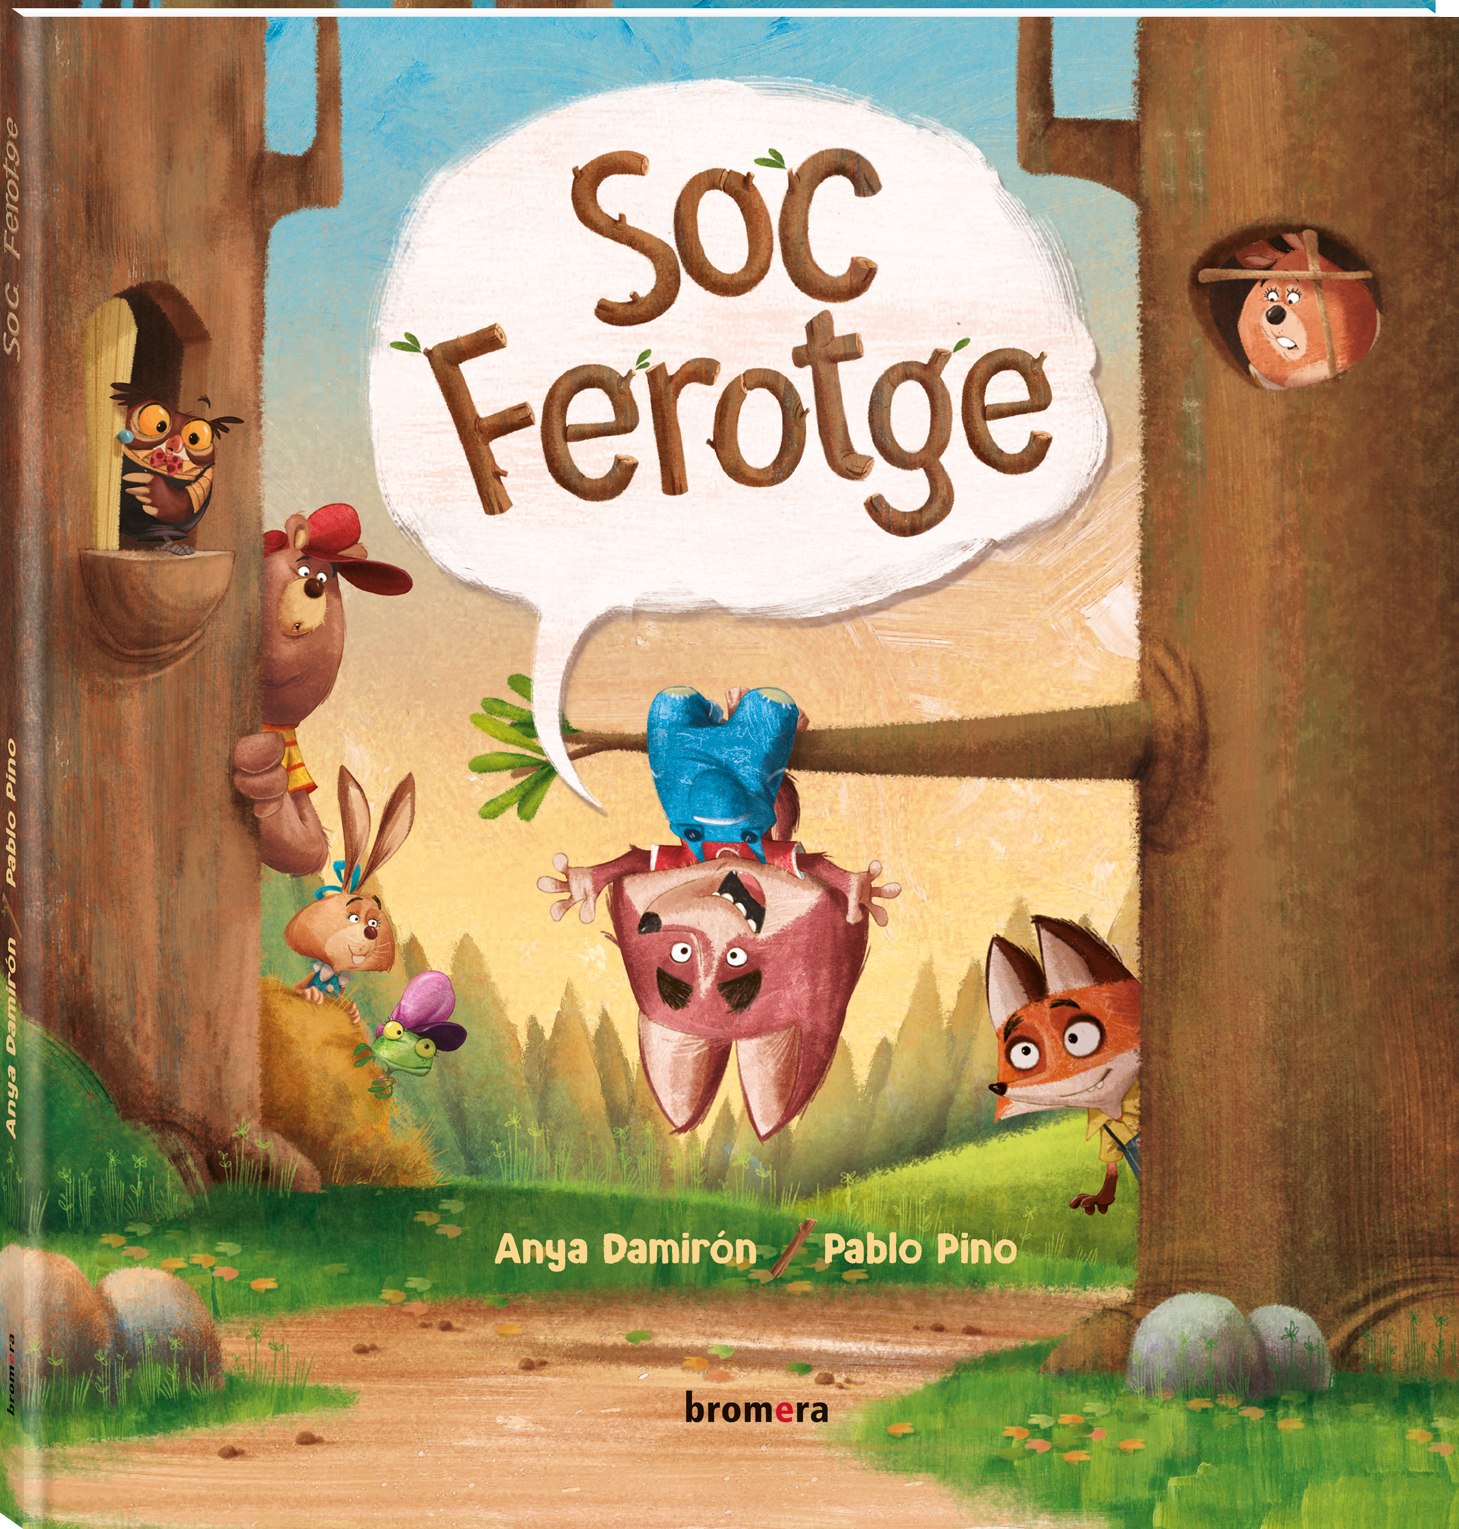 Soc-Ferotge%20bromera_1.png